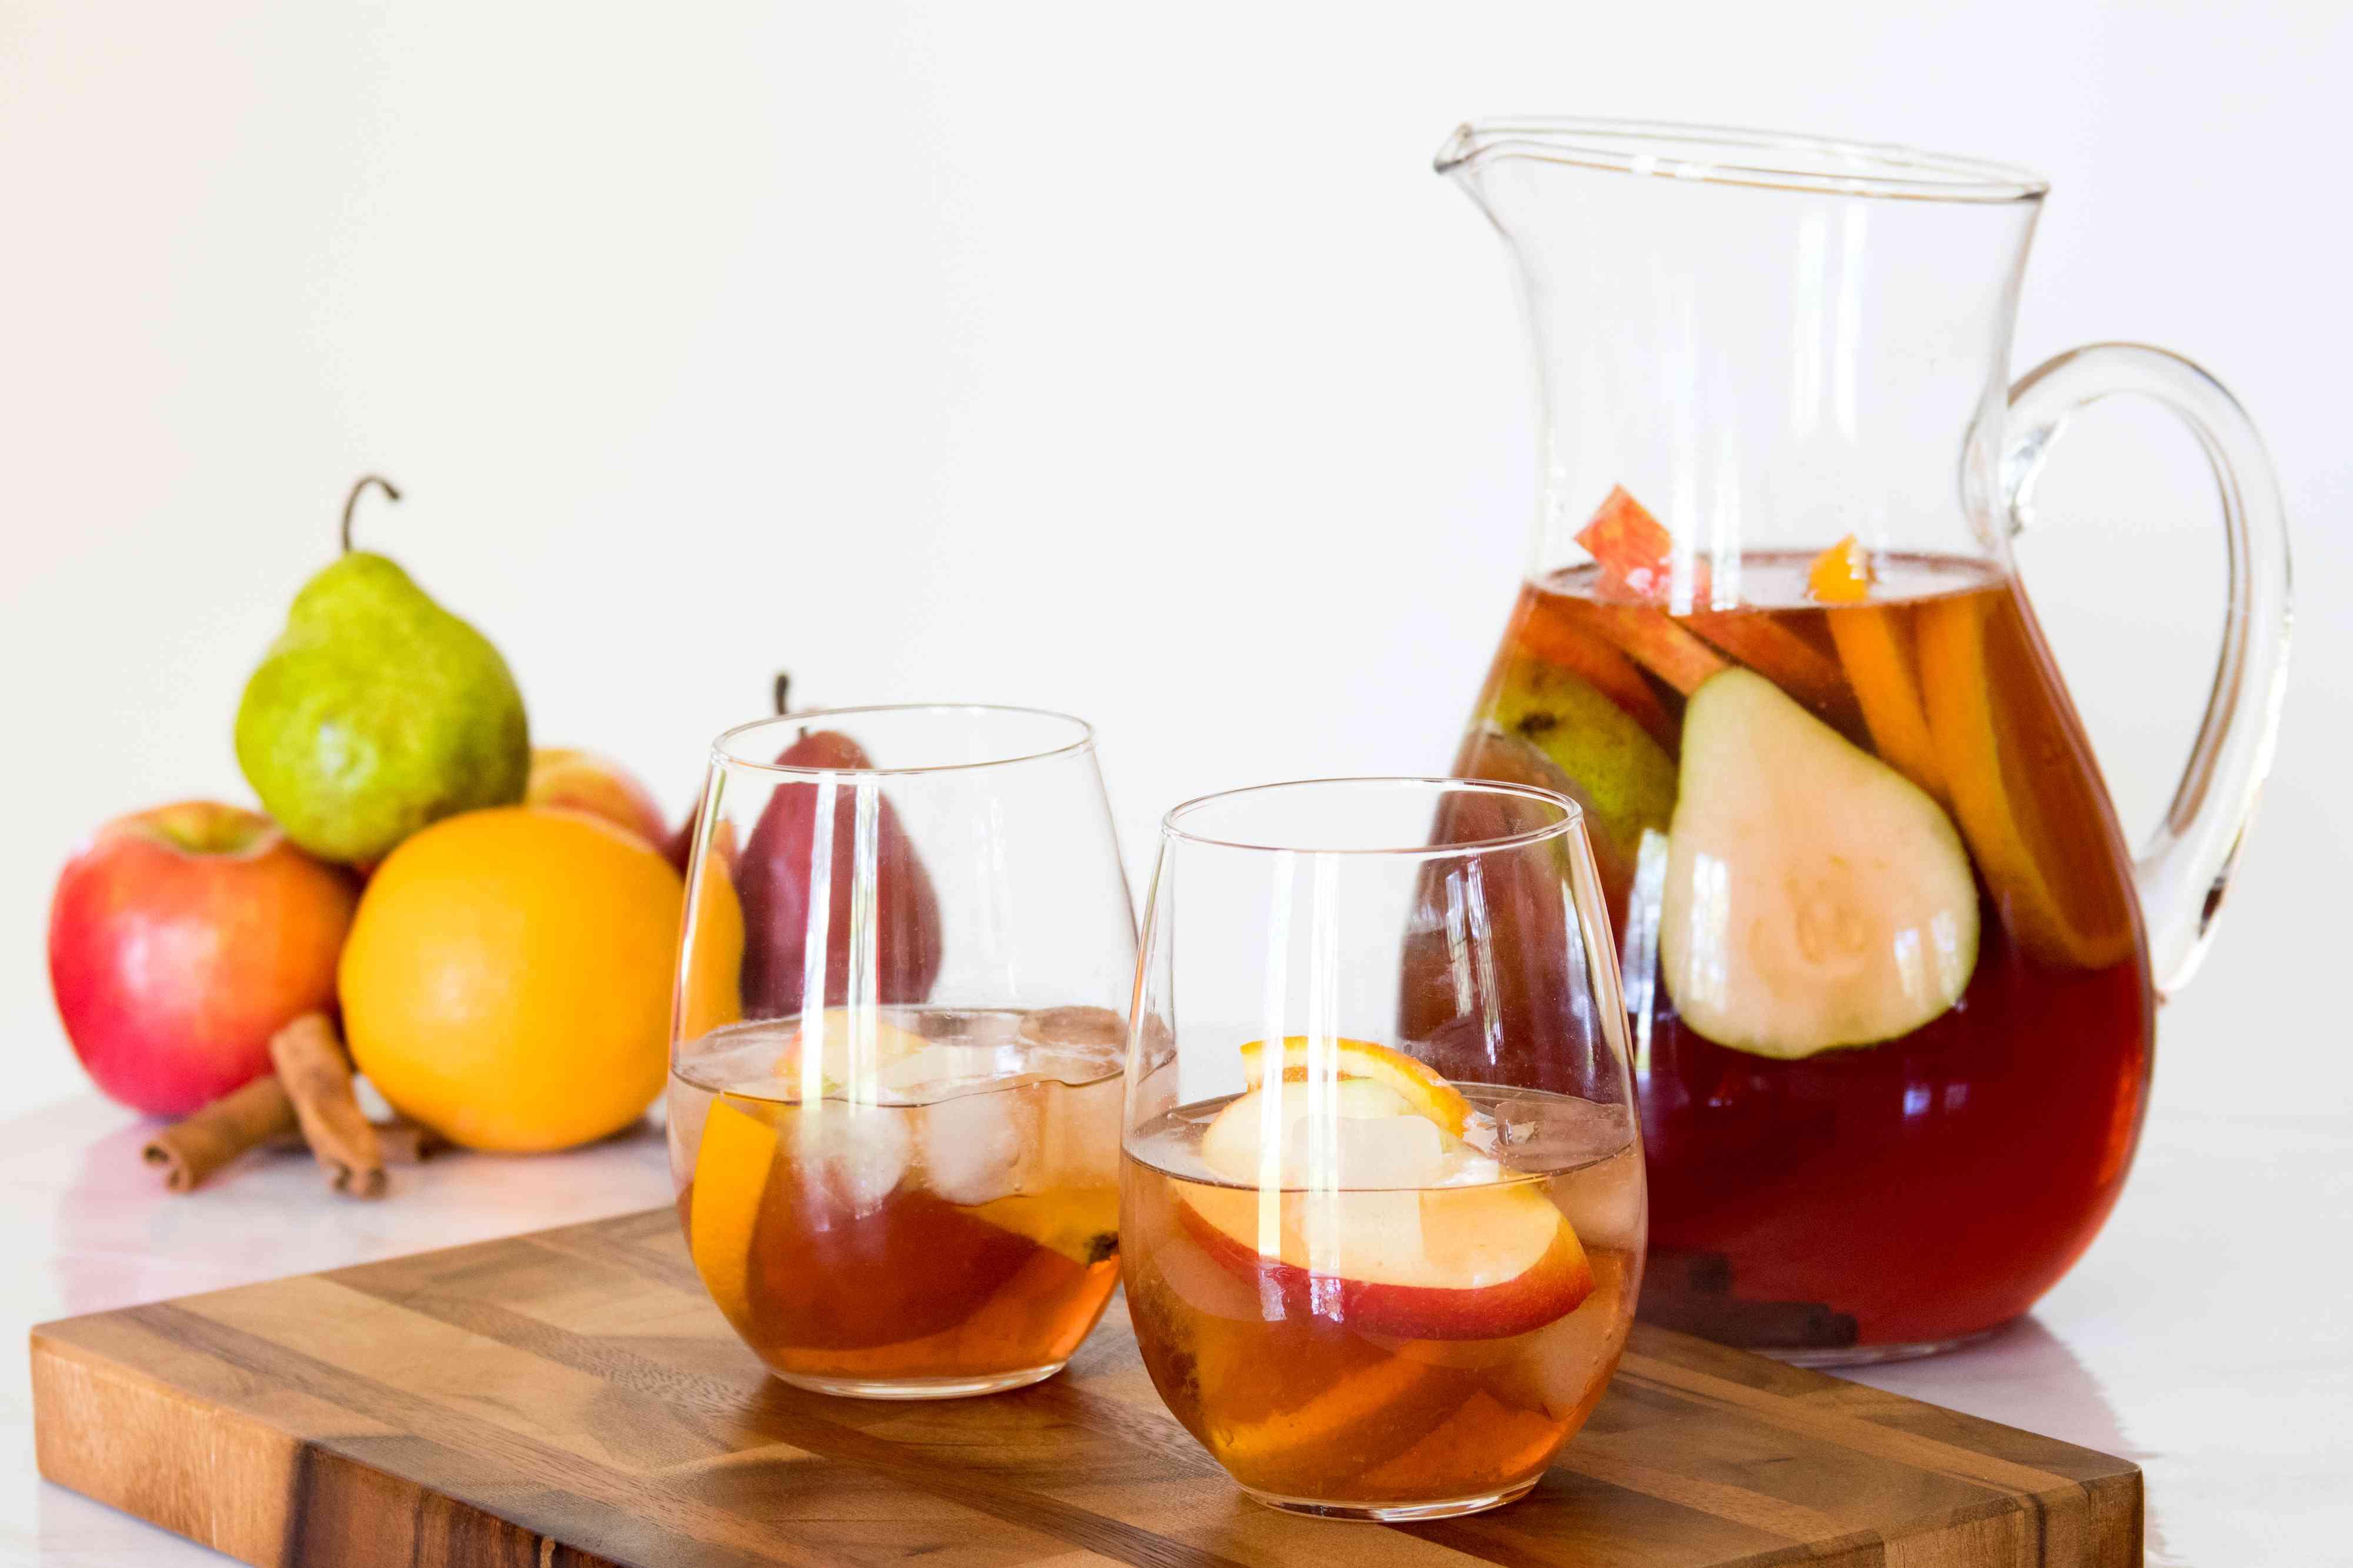 Autumn Sangria With White Wine, Pomegranate, and Green Tea